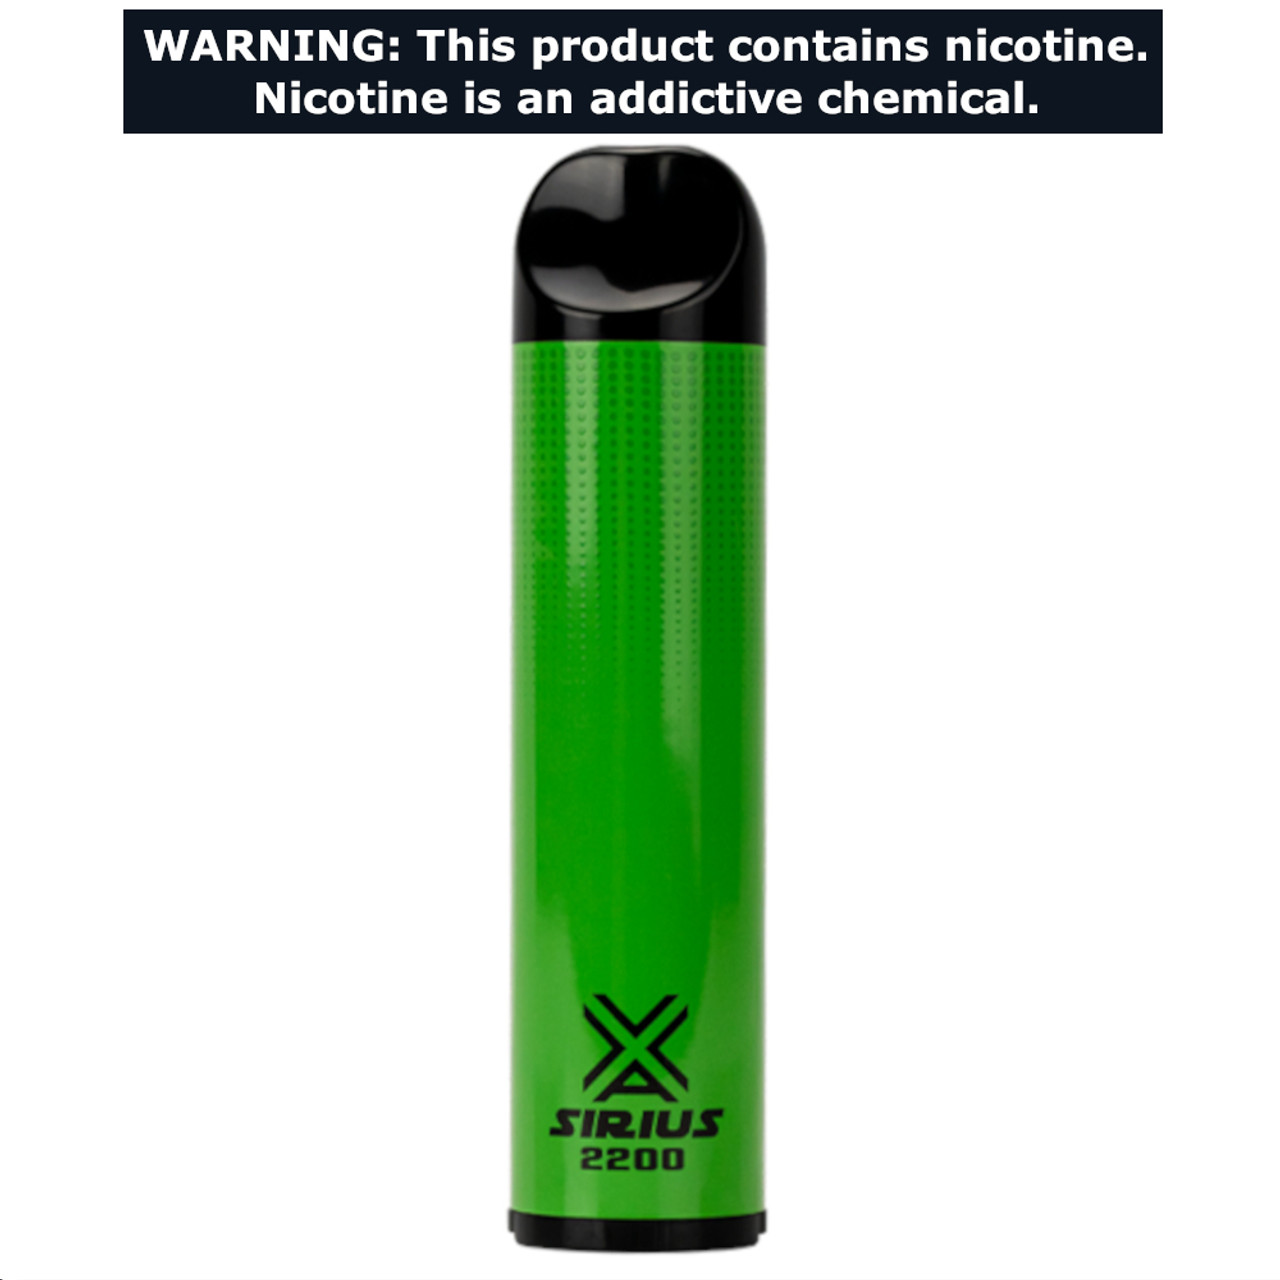 VaporLax Vape Sirius 2200 Flavored Disposables Cool Mint